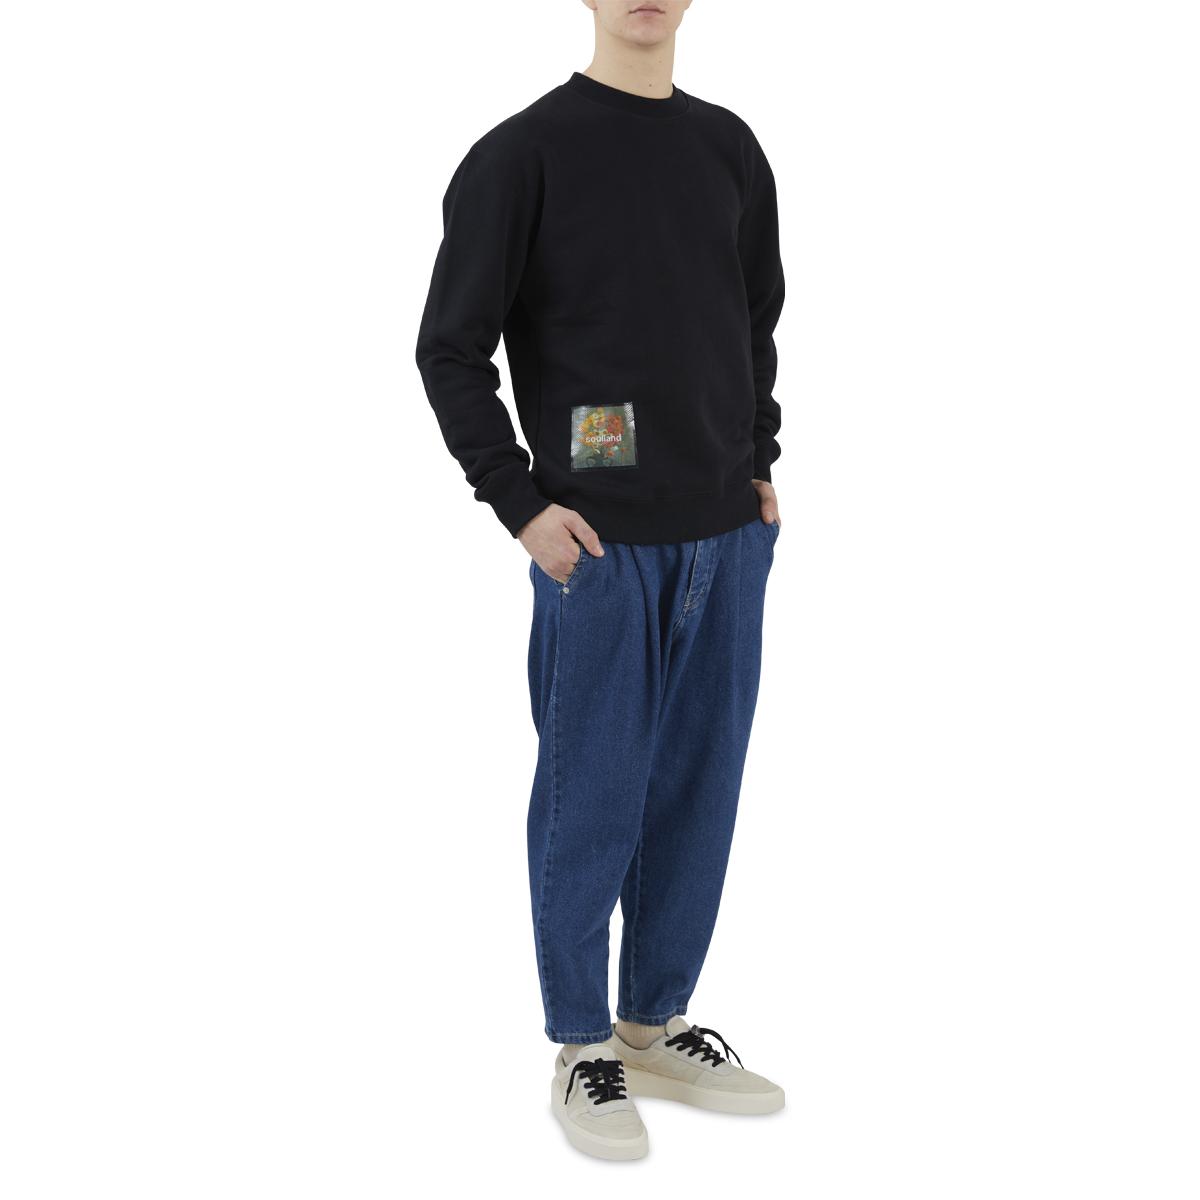 soulland Stilleben Square Sweatshirt Black Full Body